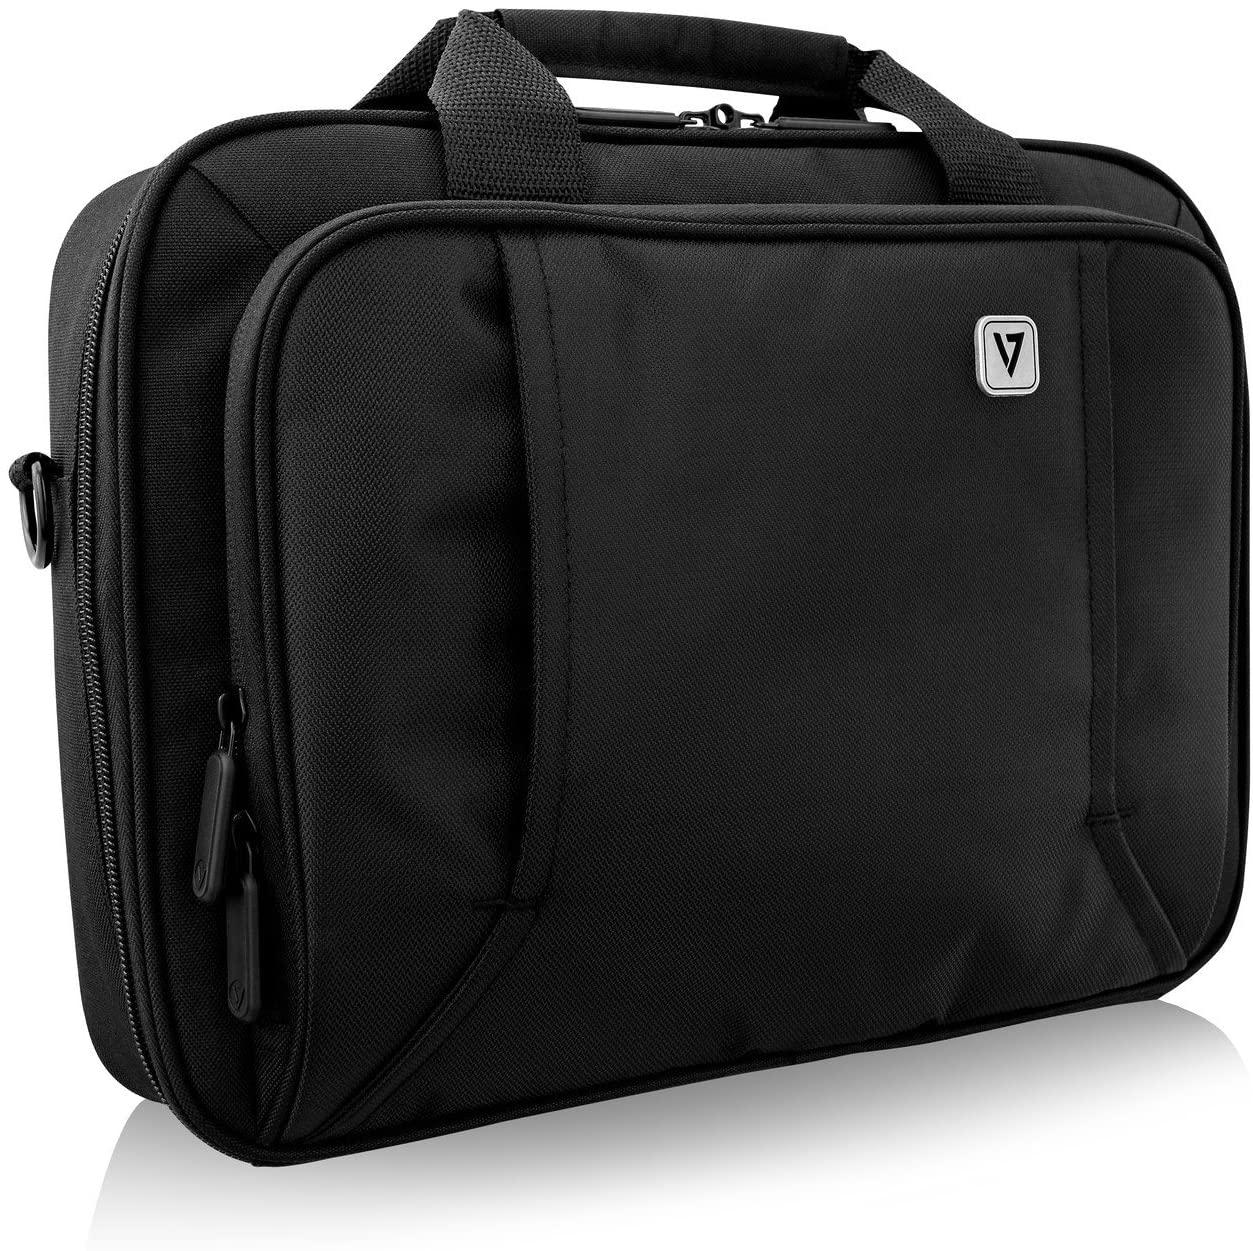 V7 CCP13-BLK-9N 13 Professional Front Loading Laptop Case (RFID, Weather Resitant)